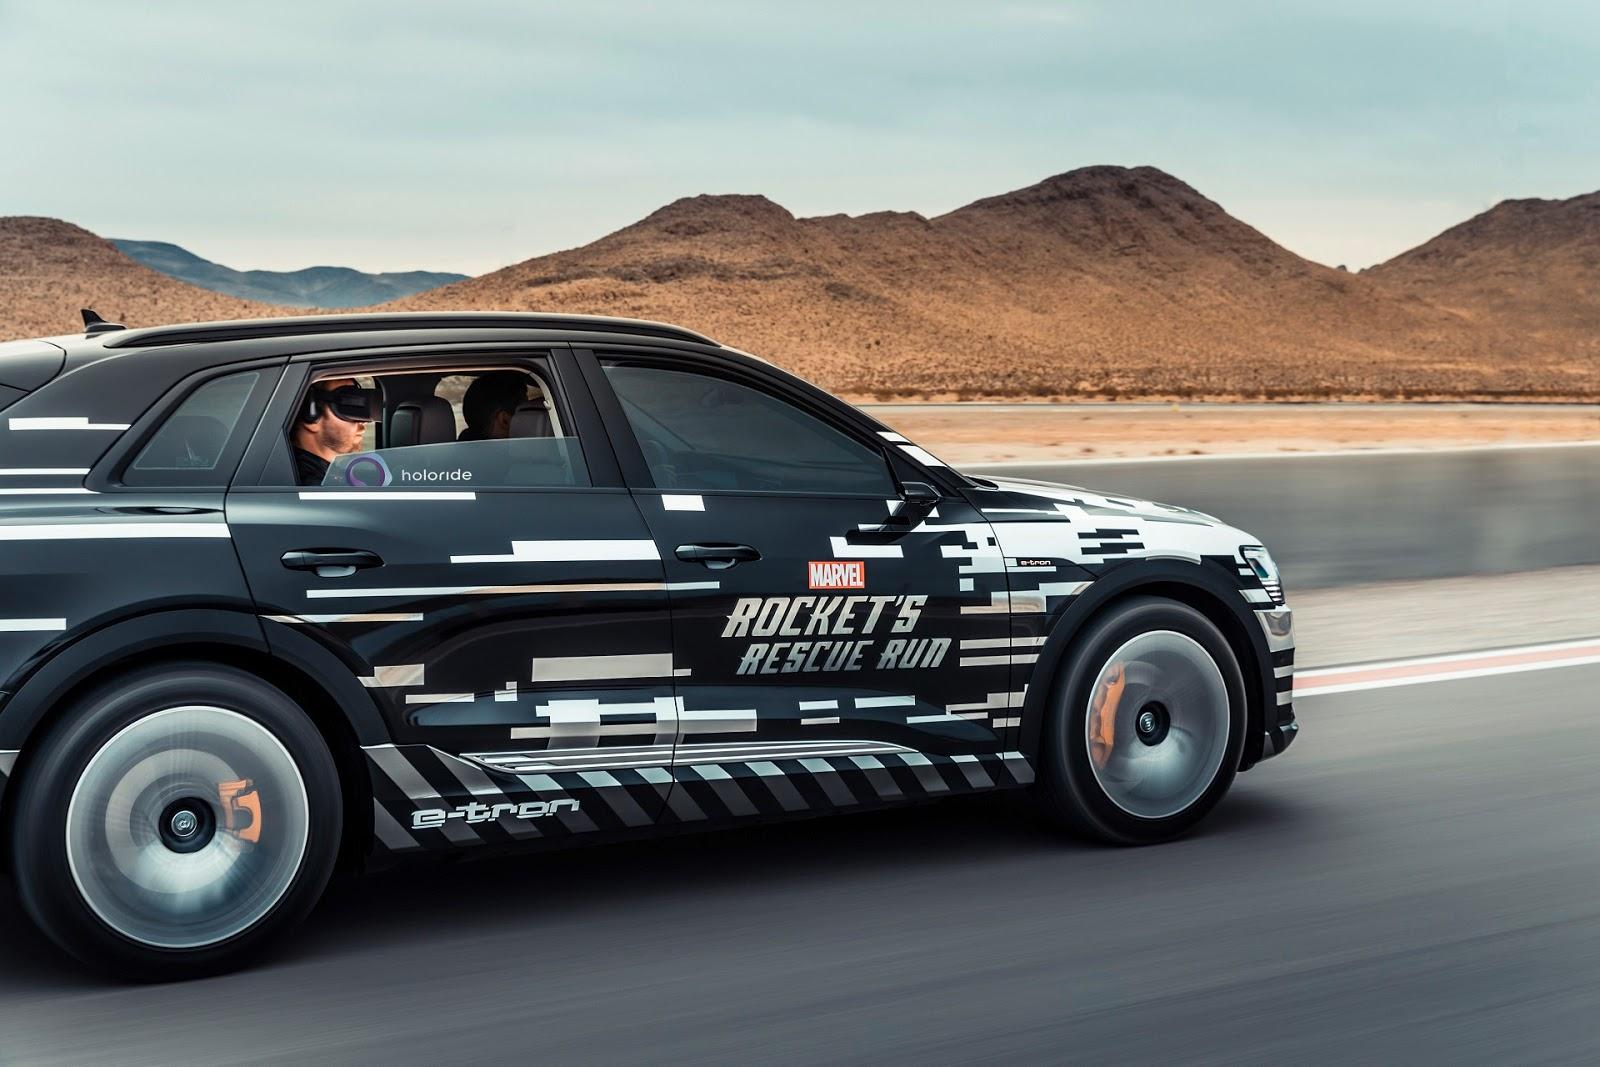 H2BAUDI2B25CE25A325CE25A425CE25972BCES 2 H Audi εξελίσσει VR videogames για το αυτοκίνητο! Audi, Electric cars, video, videos, βίντεο, Τεχνολογία